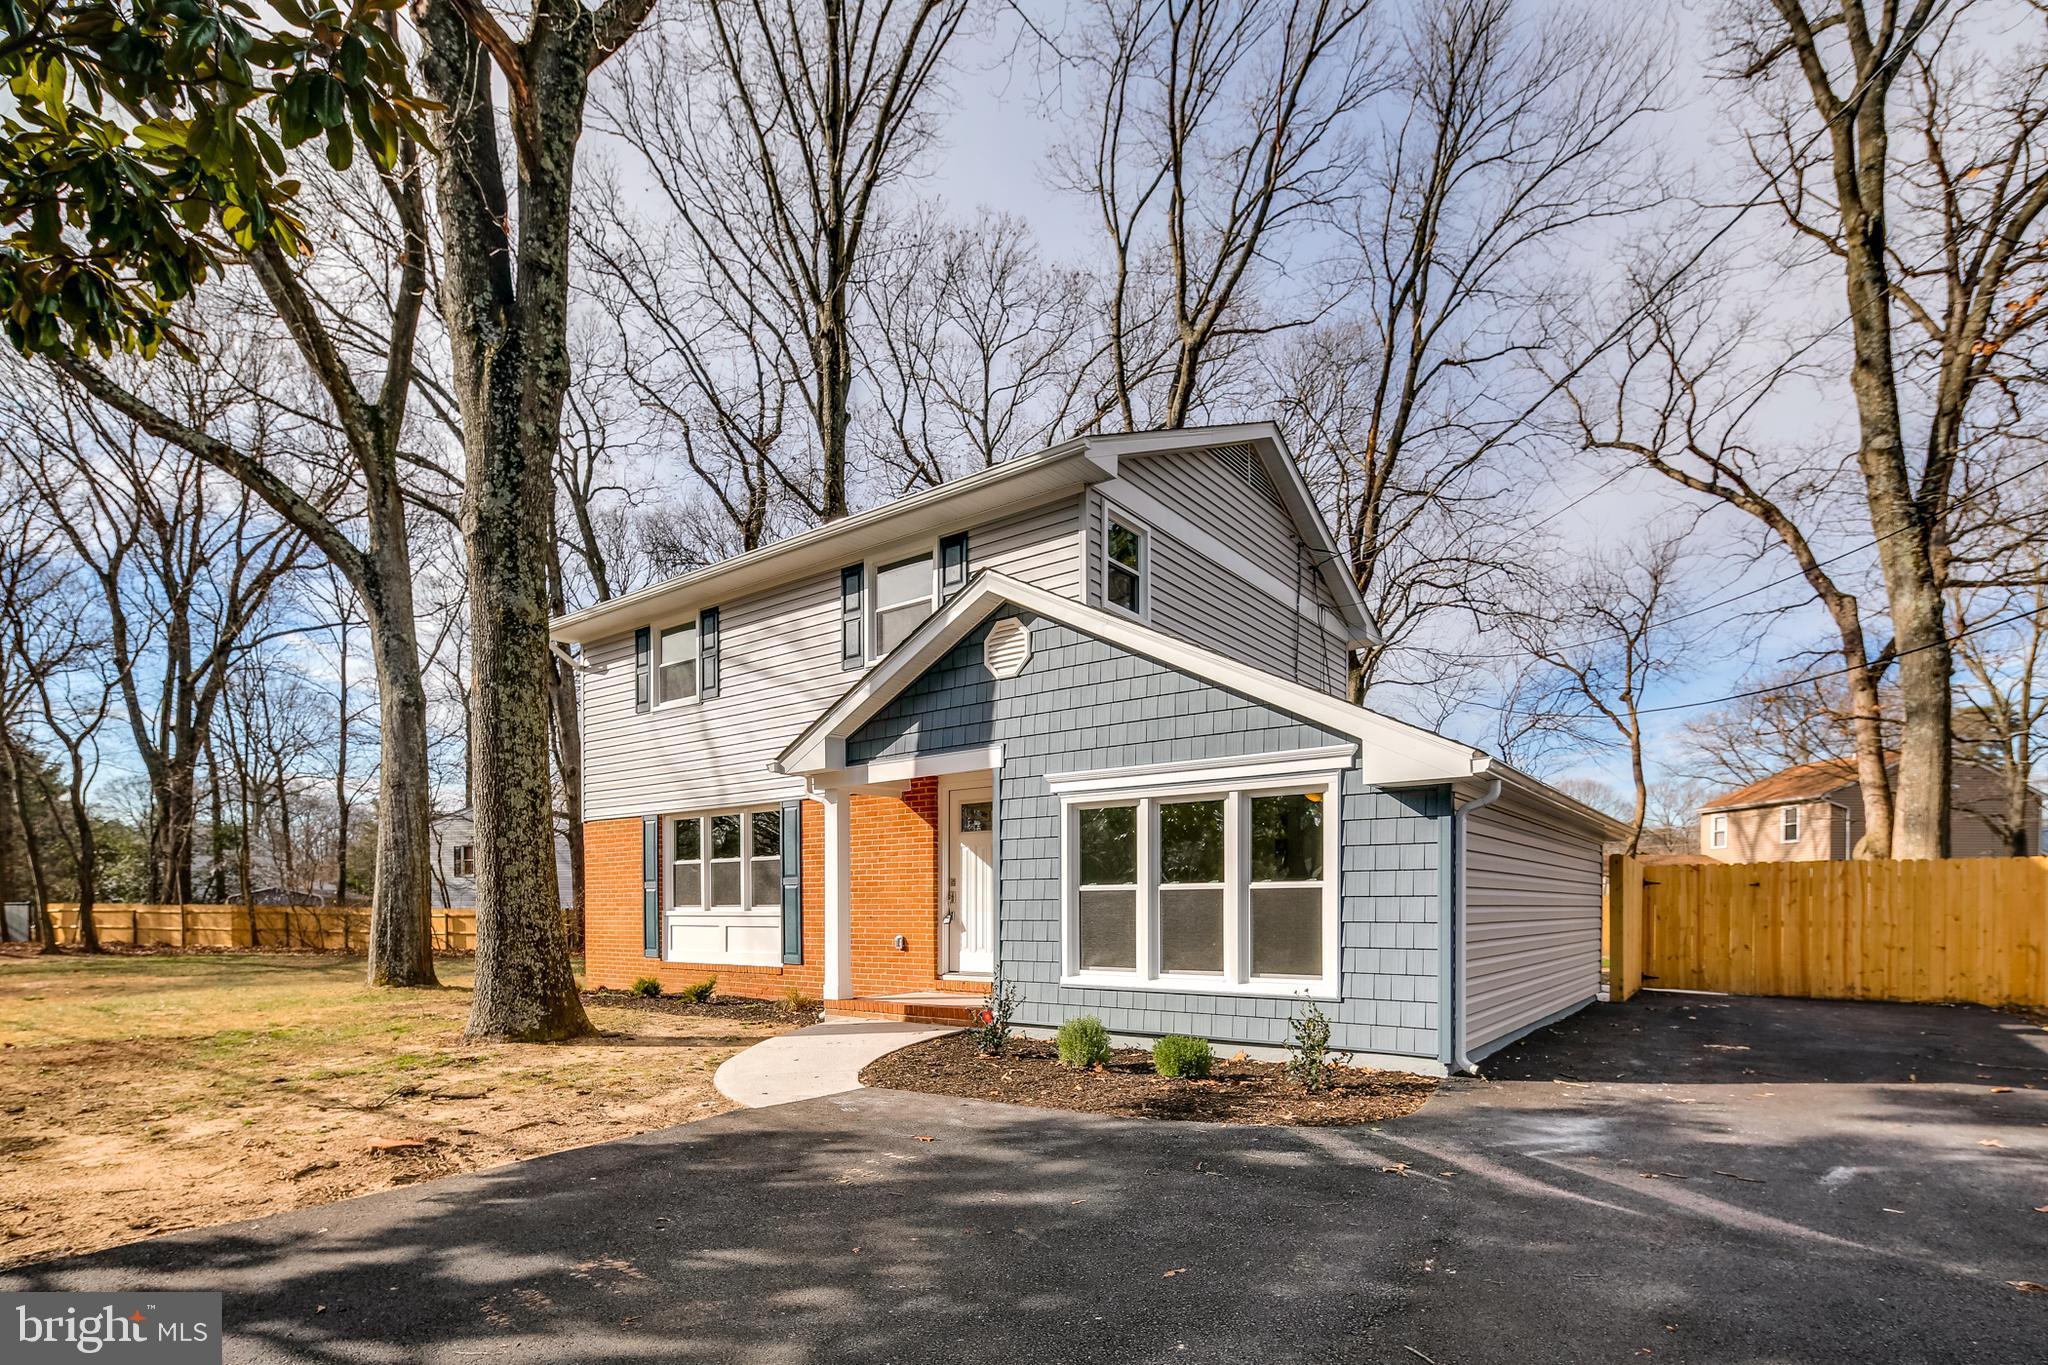 252 MAGOTHY BRIDGE ROAD, PASADENA, Maryland 21122, 4 Bedrooms Bedrooms, ,2 BathroomsBathrooms,Single Family,For Sale,252 MAGOTHY BRIDGE ROAD,MDAA451496